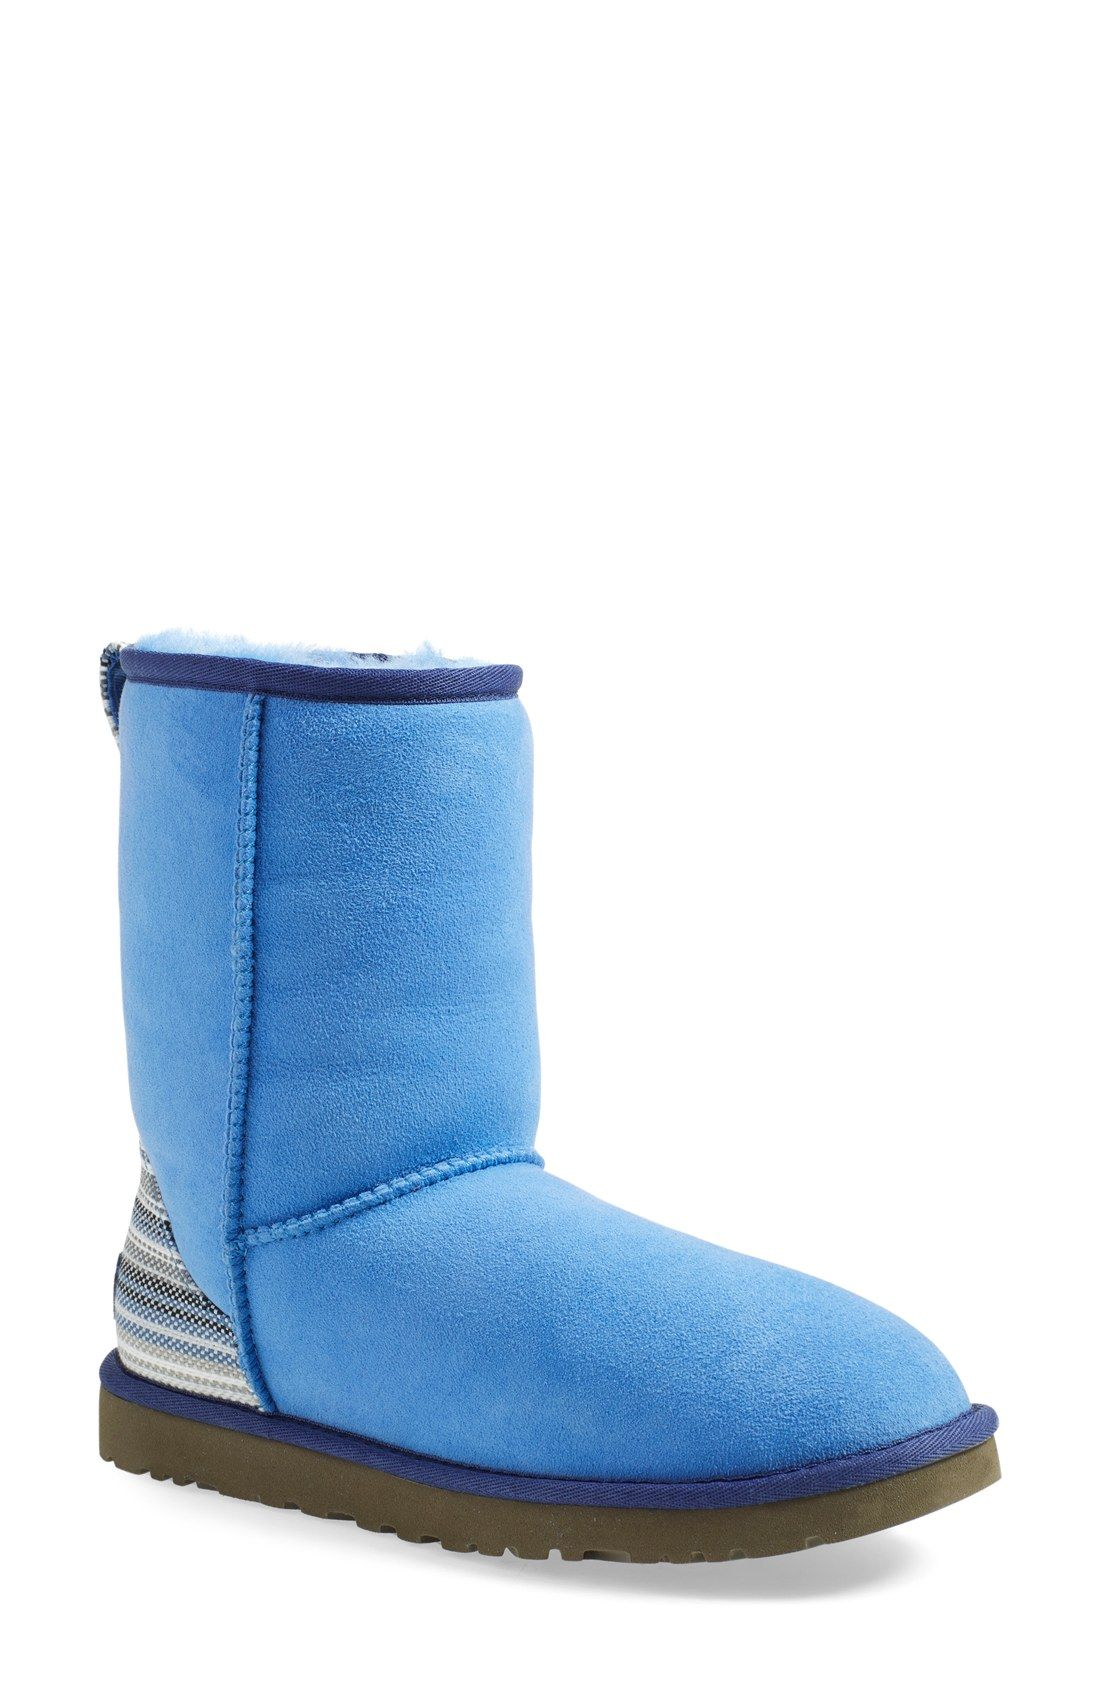 UGG® 'Classic Short - Serape' Water Resistant Boot (Women)   Nordstrom